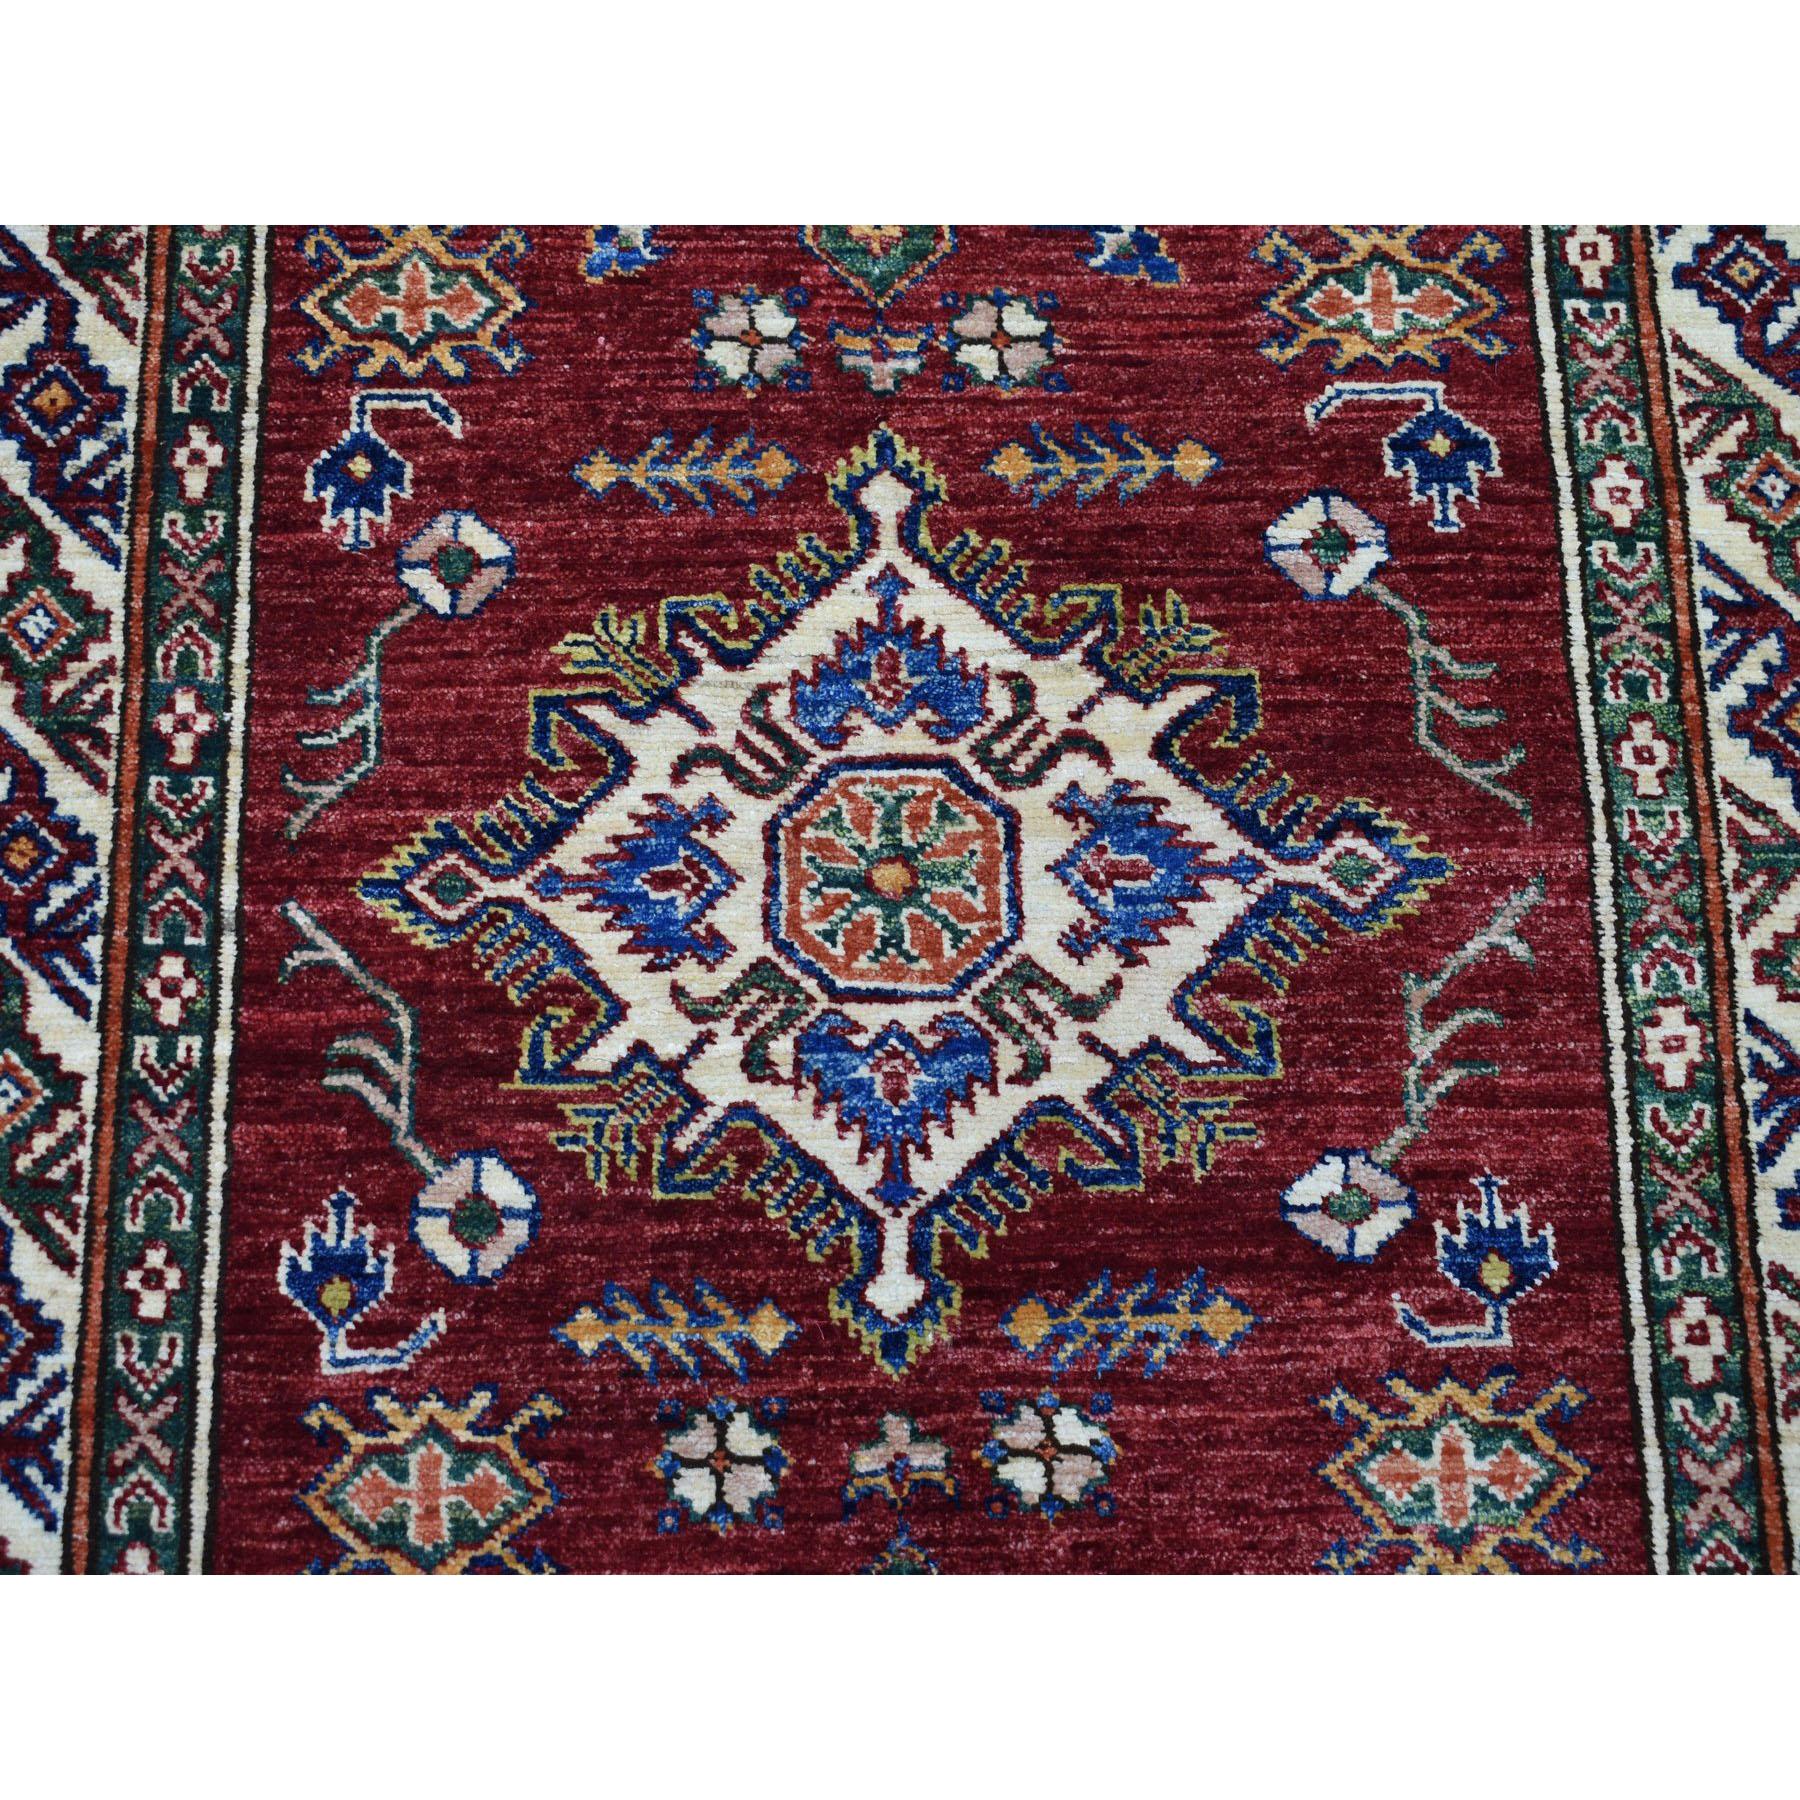 "3'4""x19' Red Super Kazak Geometric Design Pure Wool XL Runner Hand-Knotted Oriental Rug"